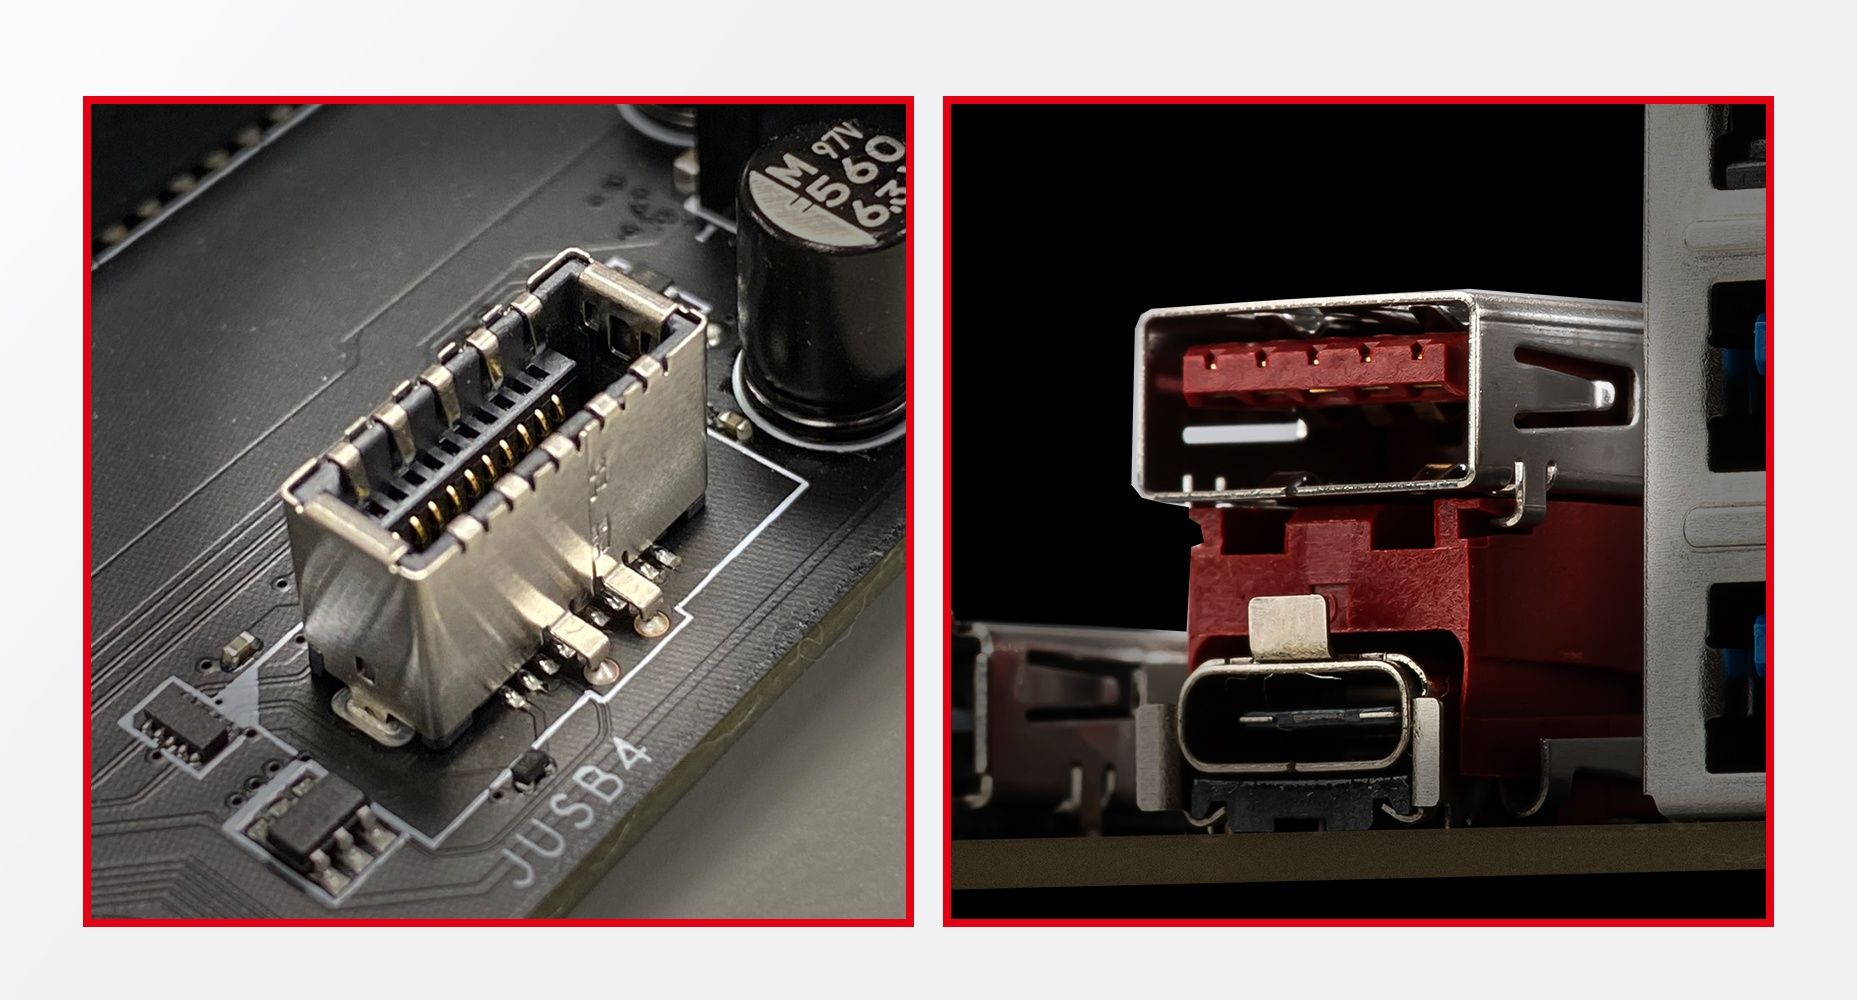 MSI MEG B550 UNIFY USB Type-C ready in both Front case panel & Rear IO